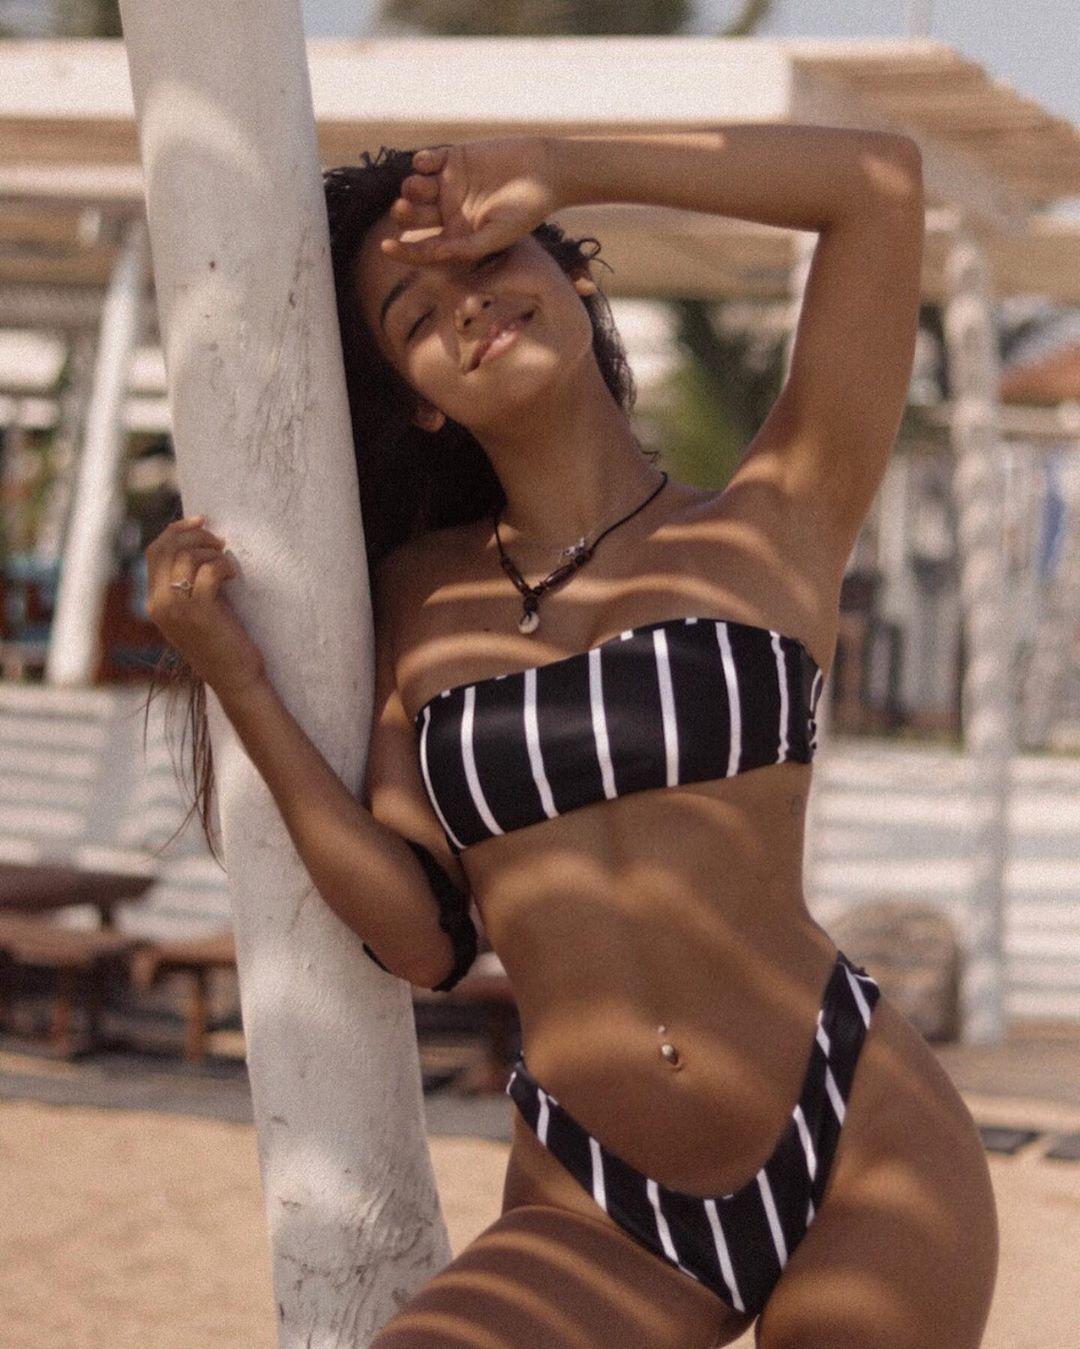 Angie Costa